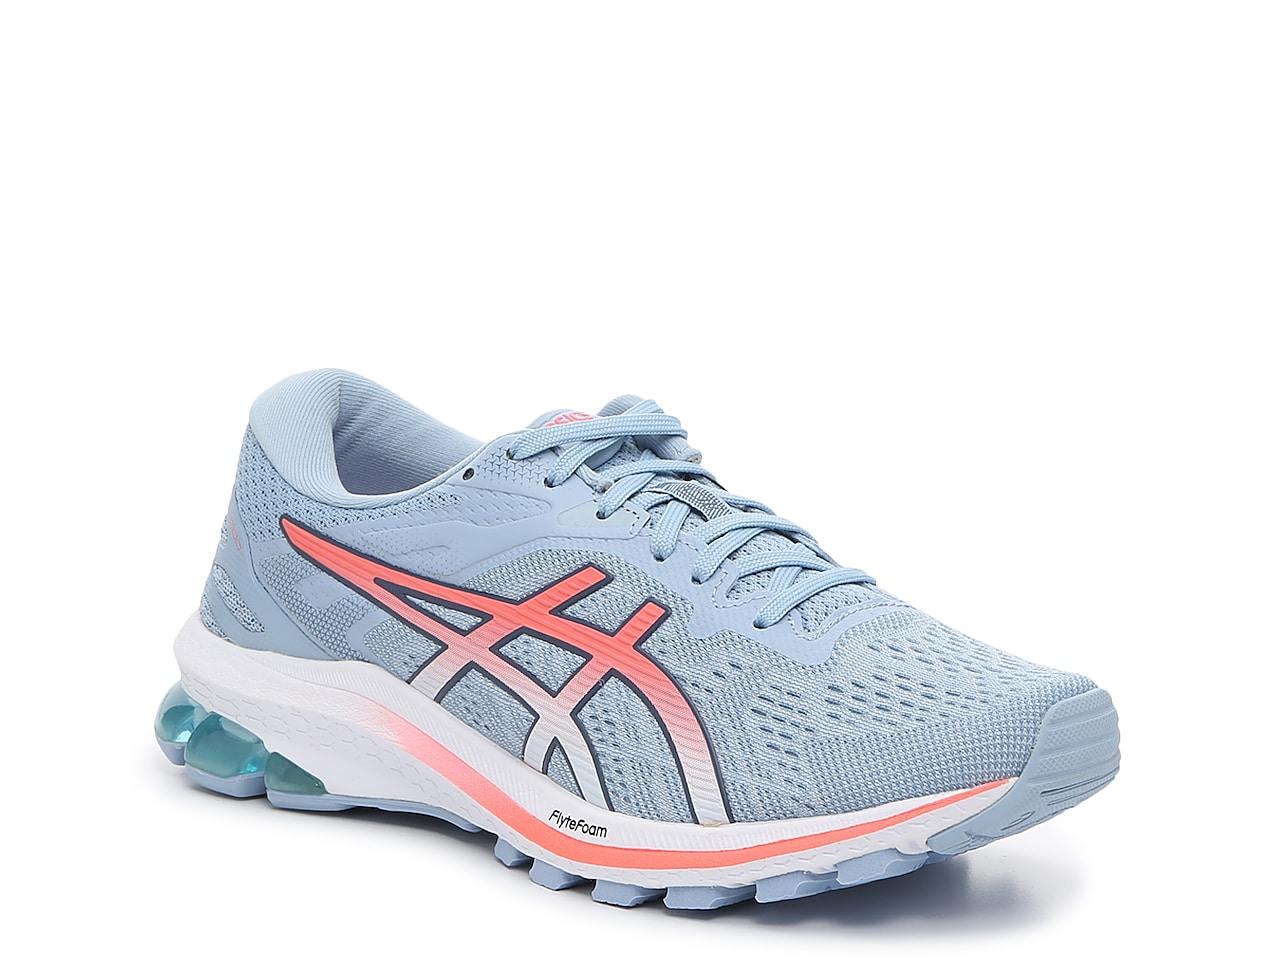 ASICS GT-1000 10 Running Shoe - Women's